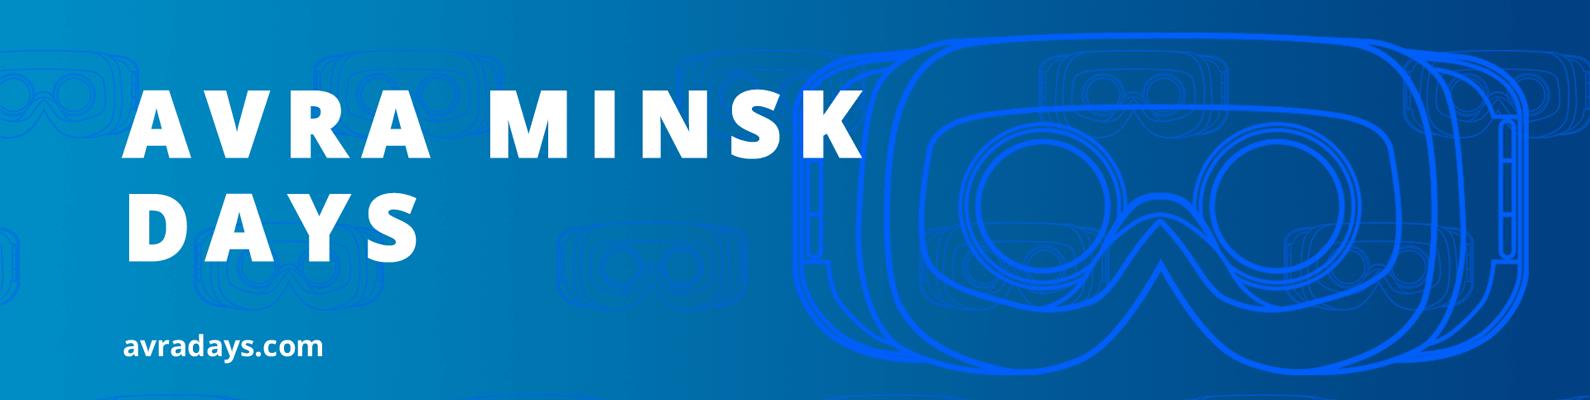 AVRA MINSK DAYS: конференция и хакатон о VR/AR-технологиях в Минске